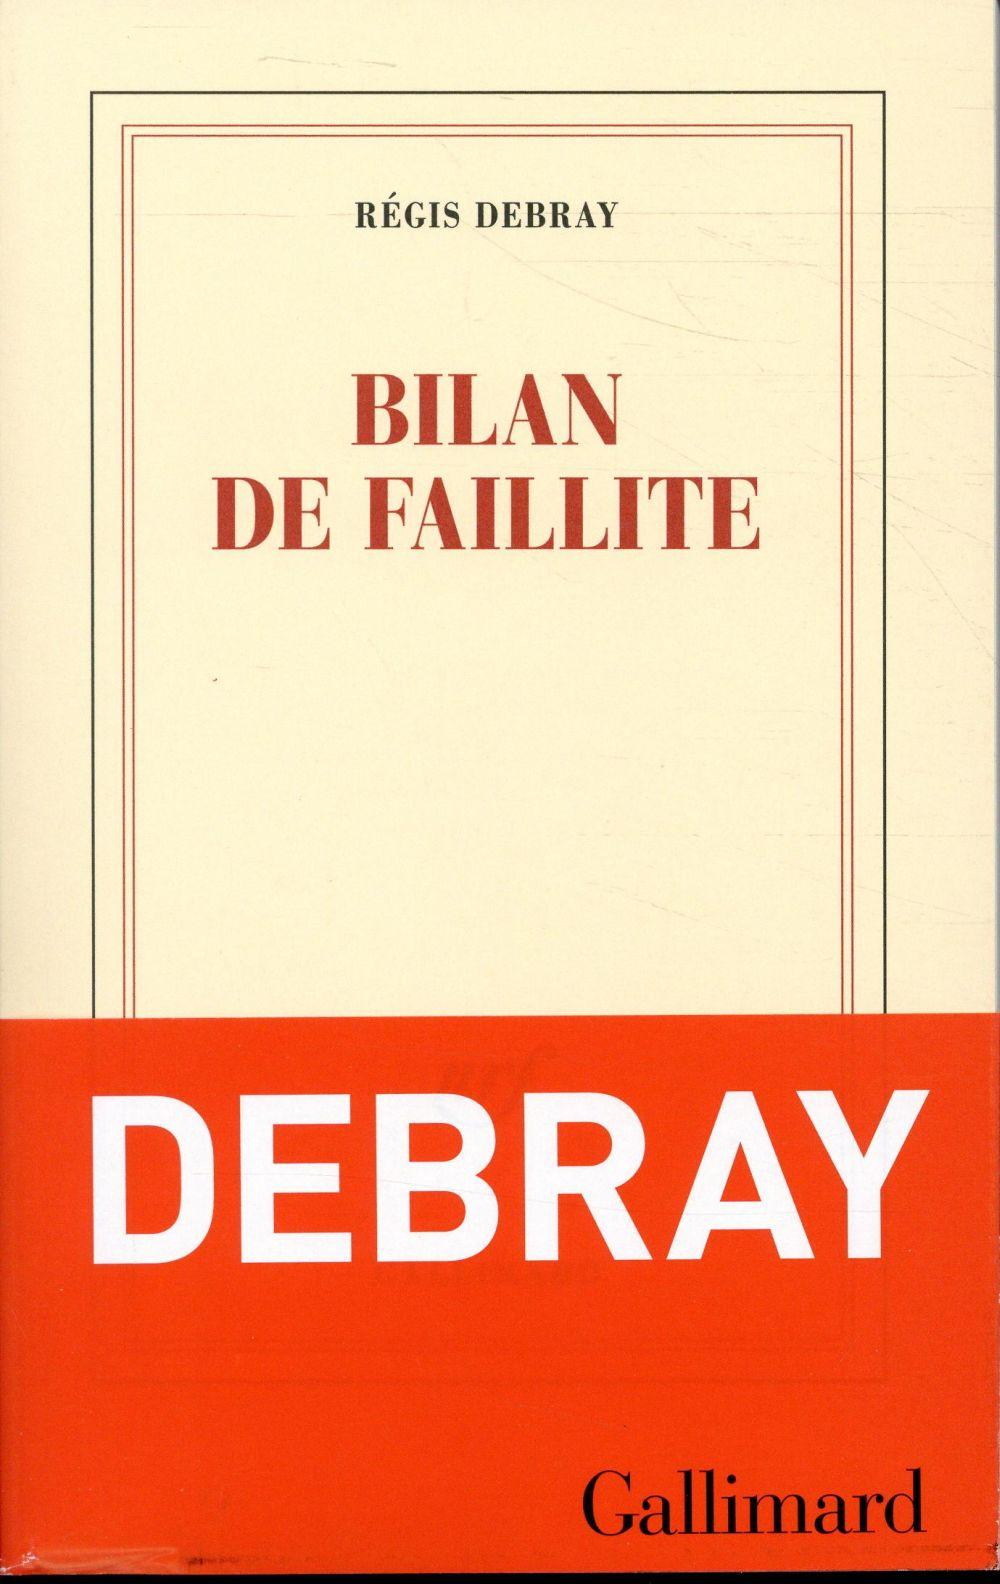 BILAN DE FAILLITE DEBRAY REGIS GALLIMARD